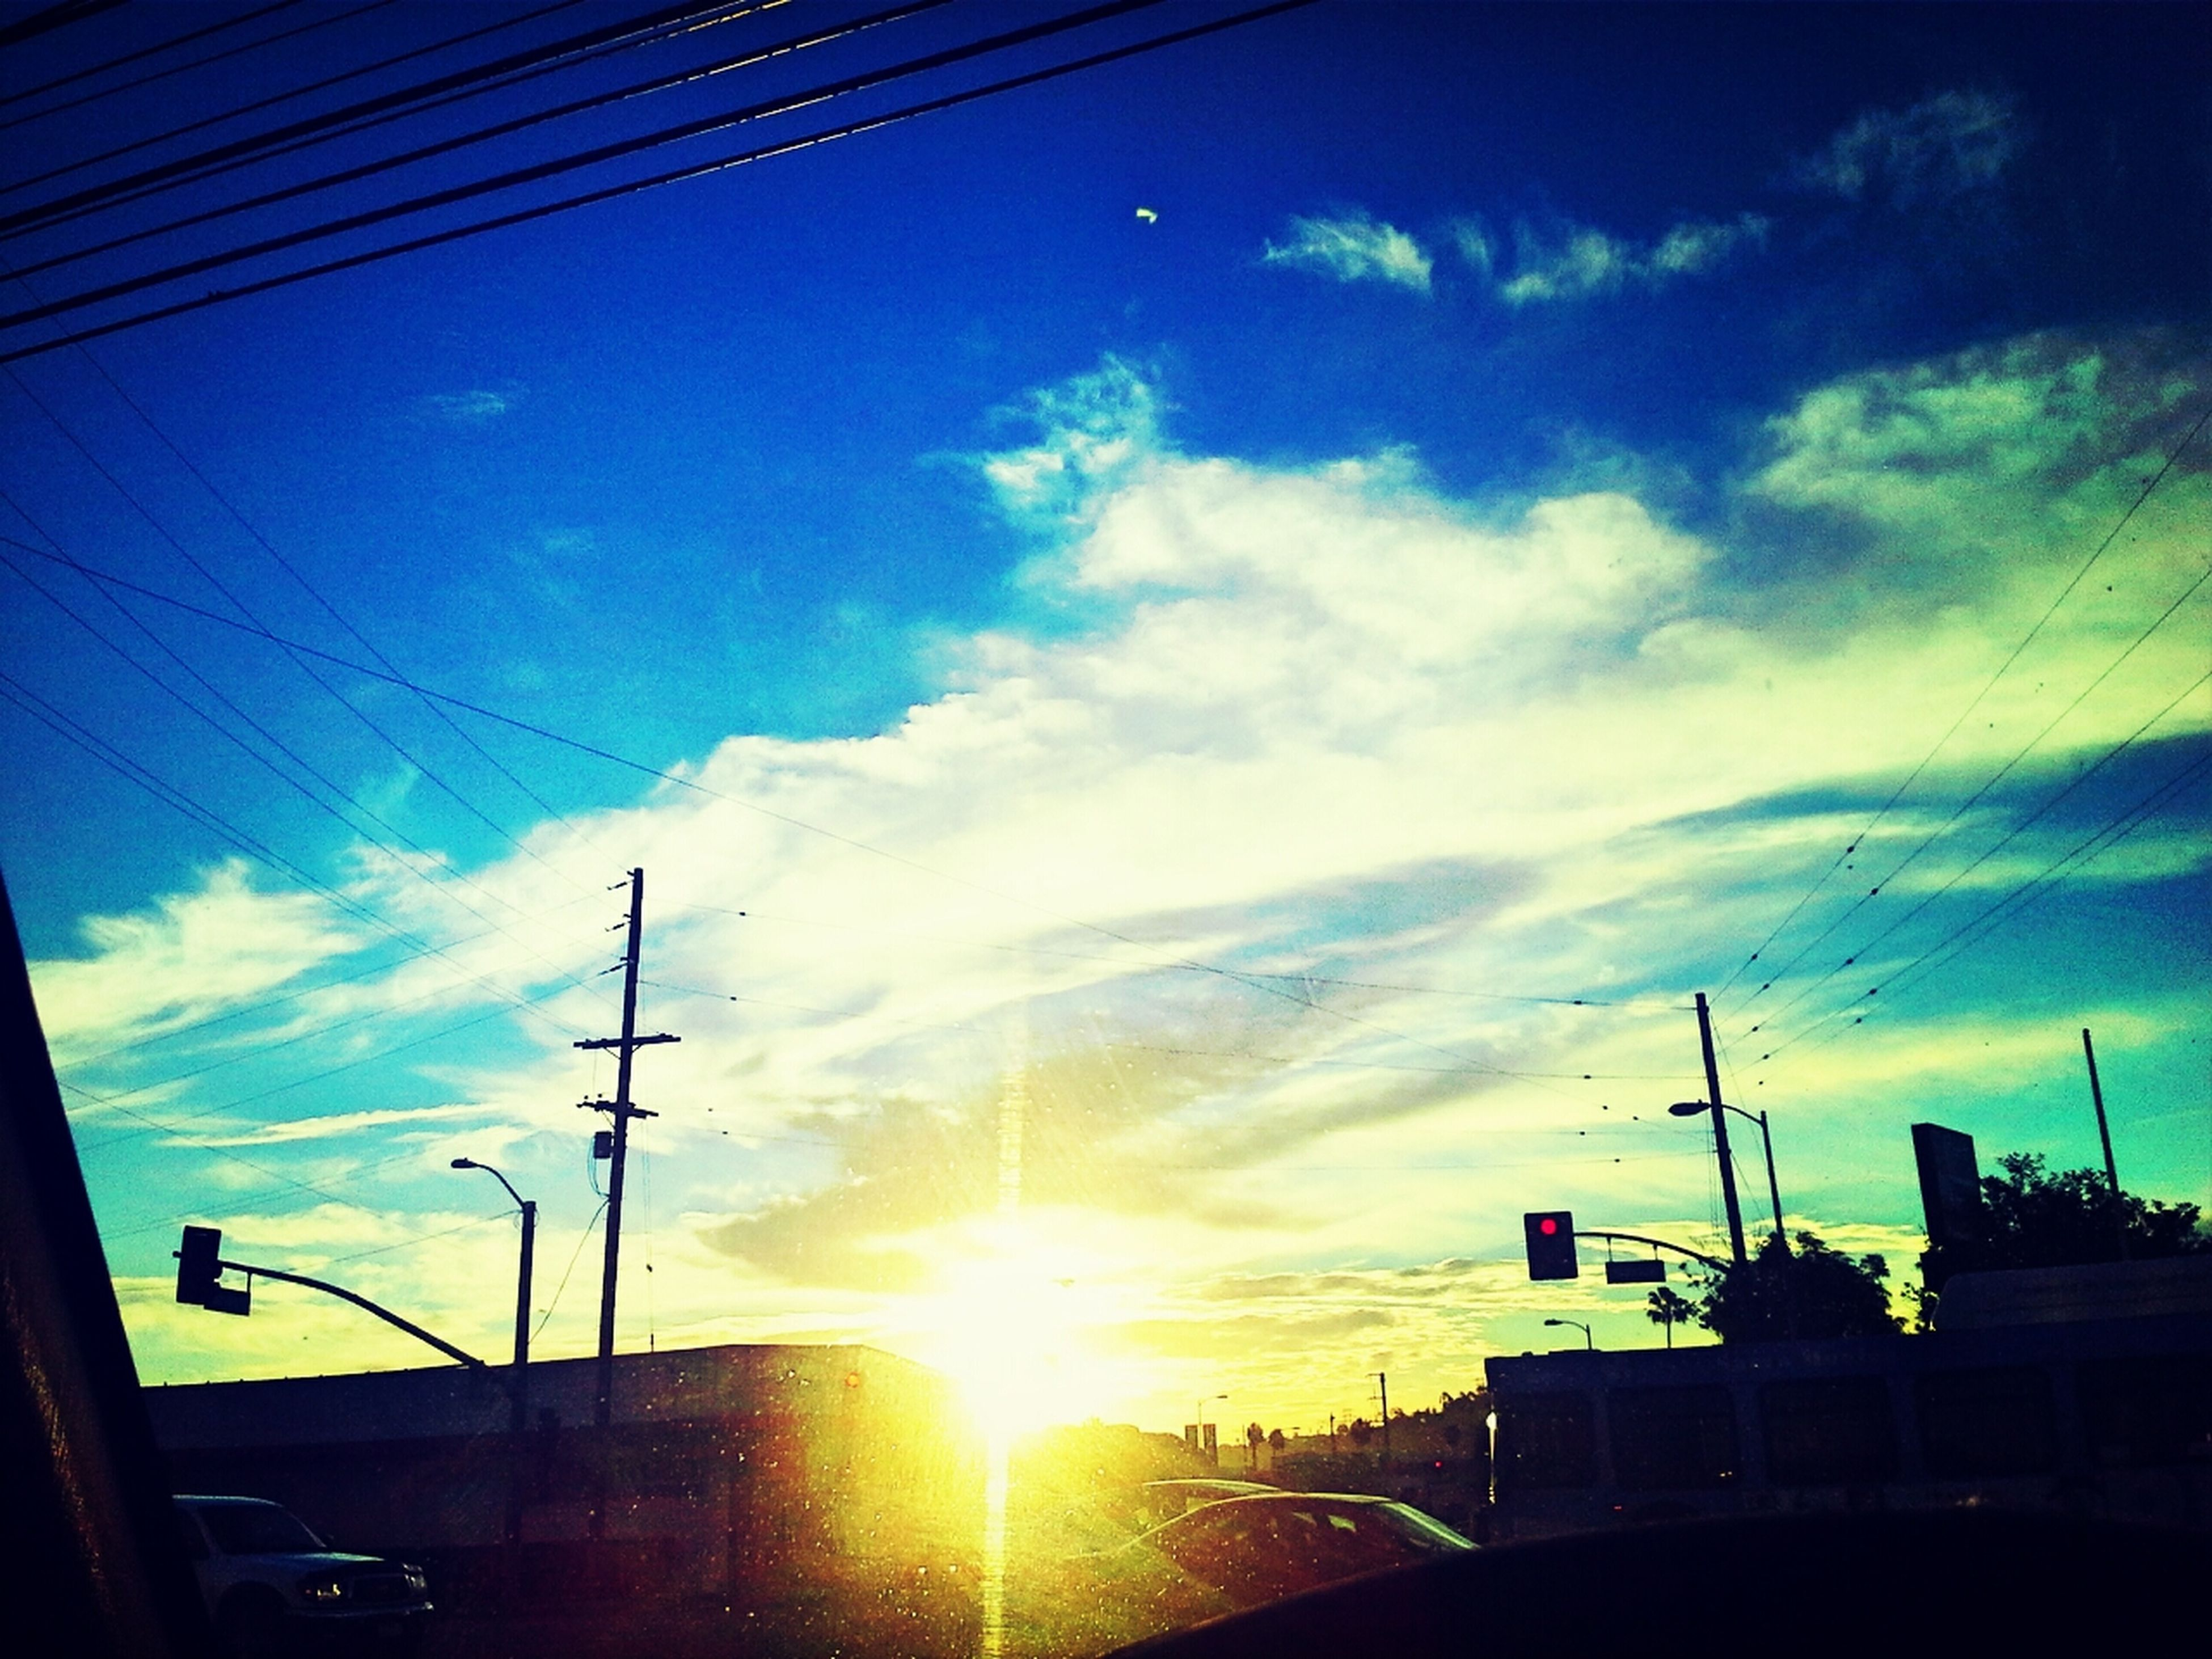 building exterior, built structure, sky, sunset, sun, architecture, silhouette, low angle view, power line, sunlight, sunbeam, electricity pylon, cloud - sky, cable, cloud, electricity, lens flare, house, car, power supply